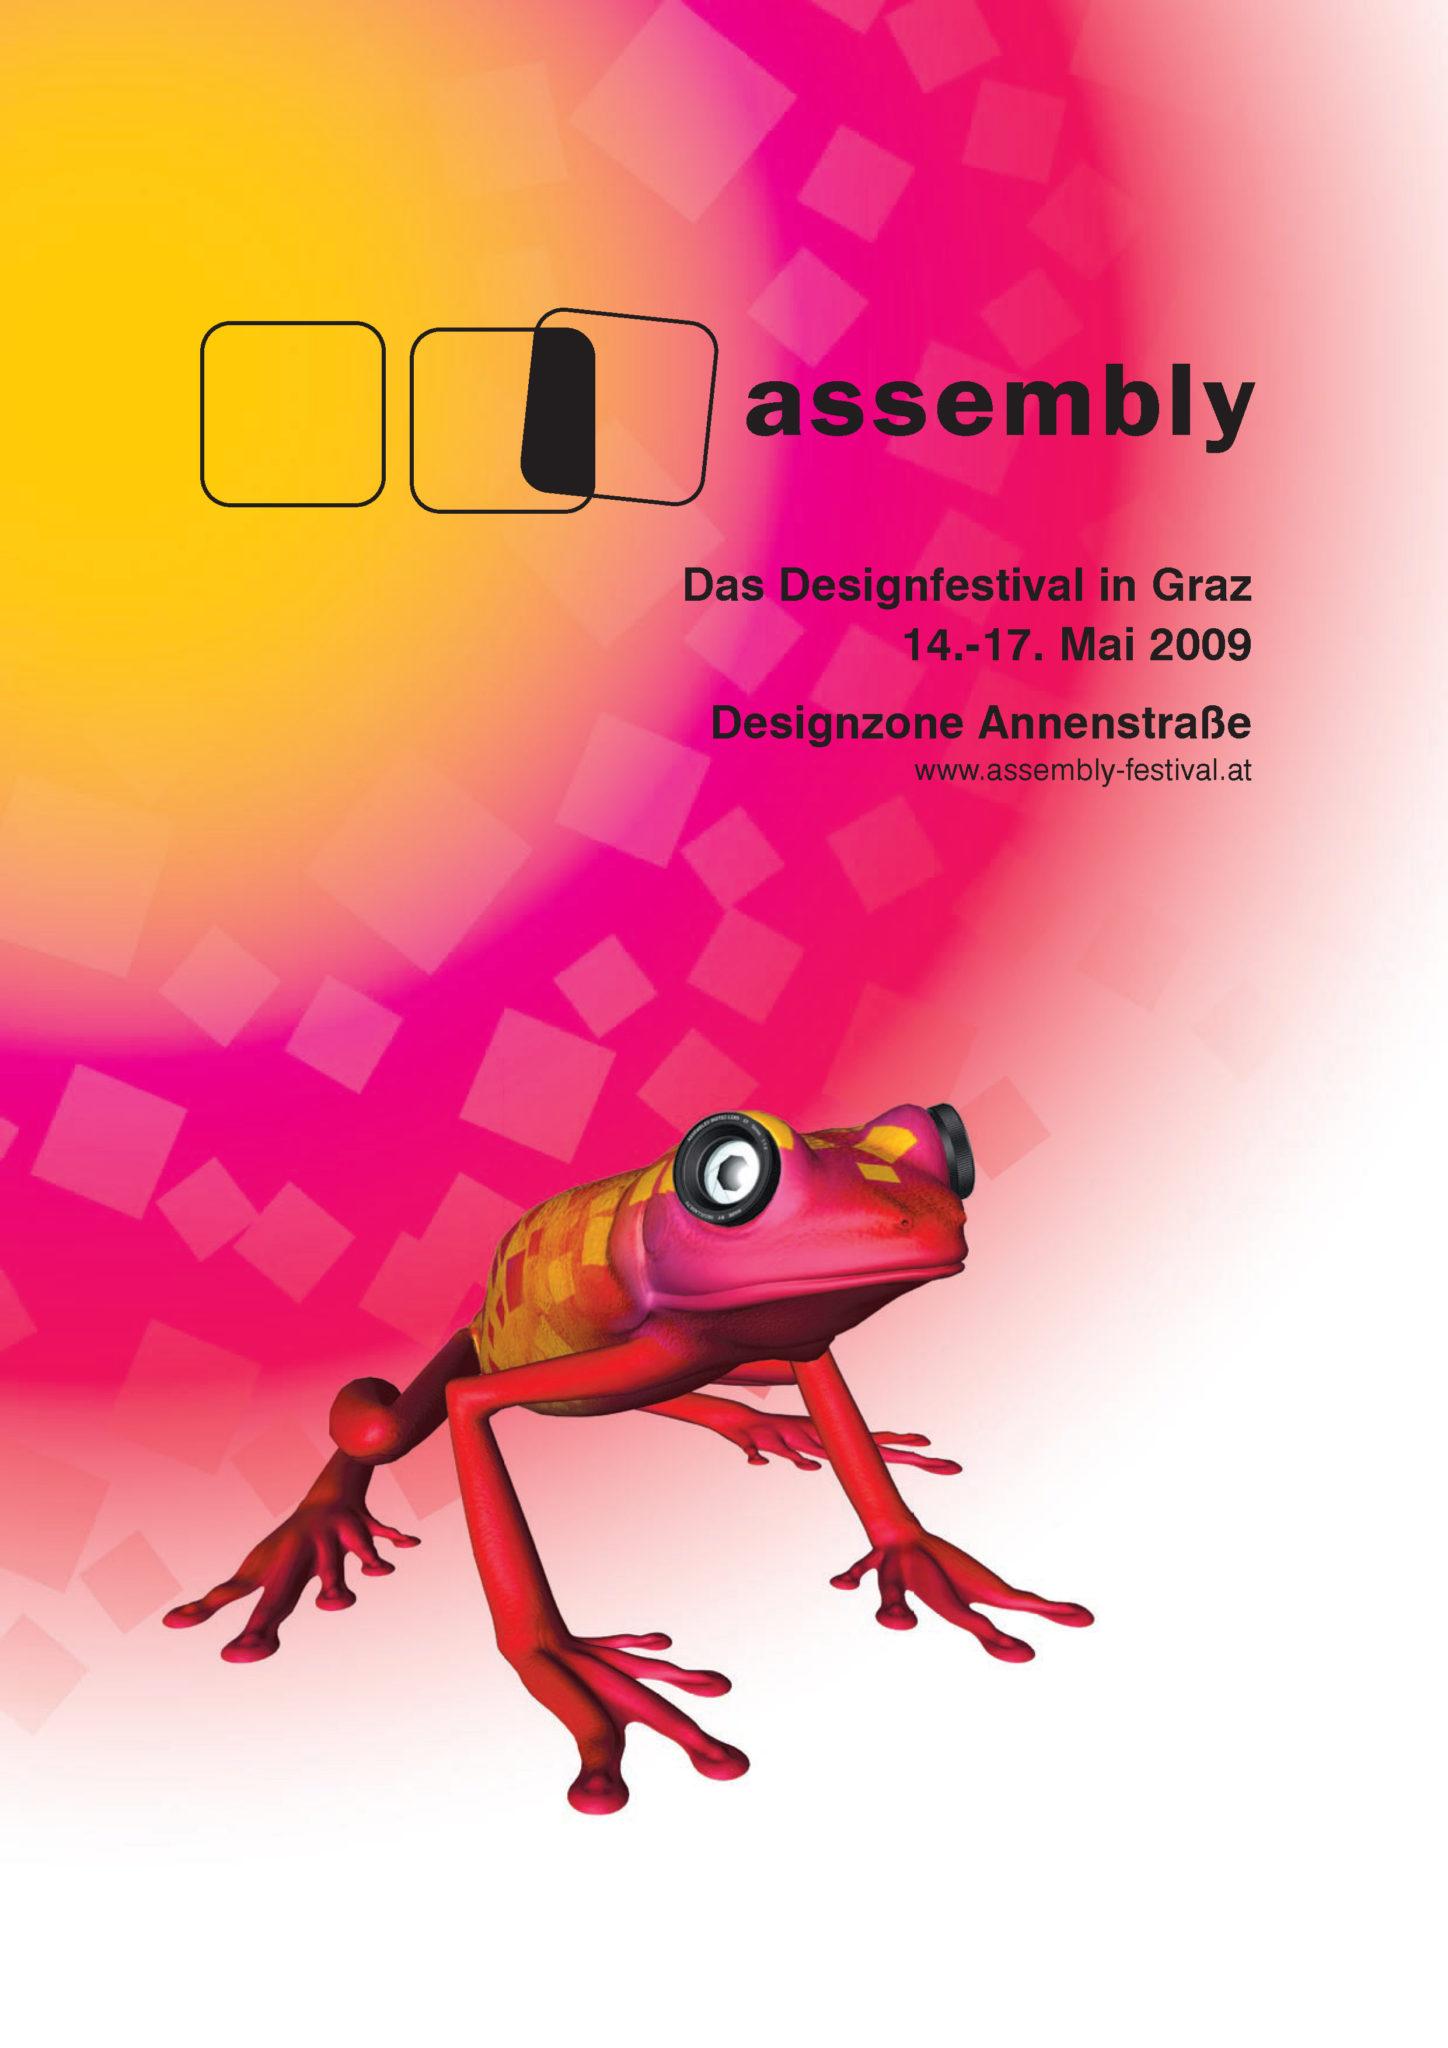 assembly Festival Archive 2009